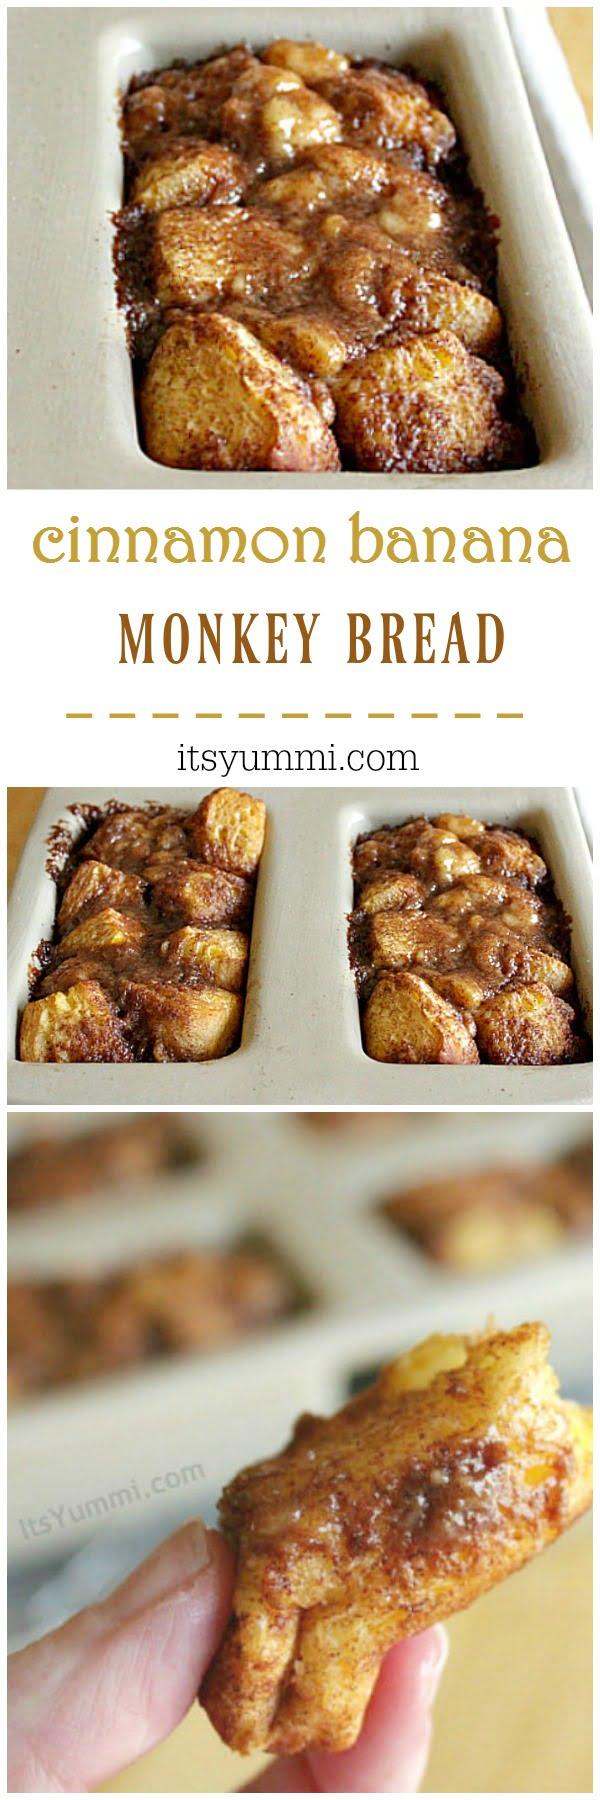 Cinnamon Banana Monkey Bread   recipe on itsyummi.com